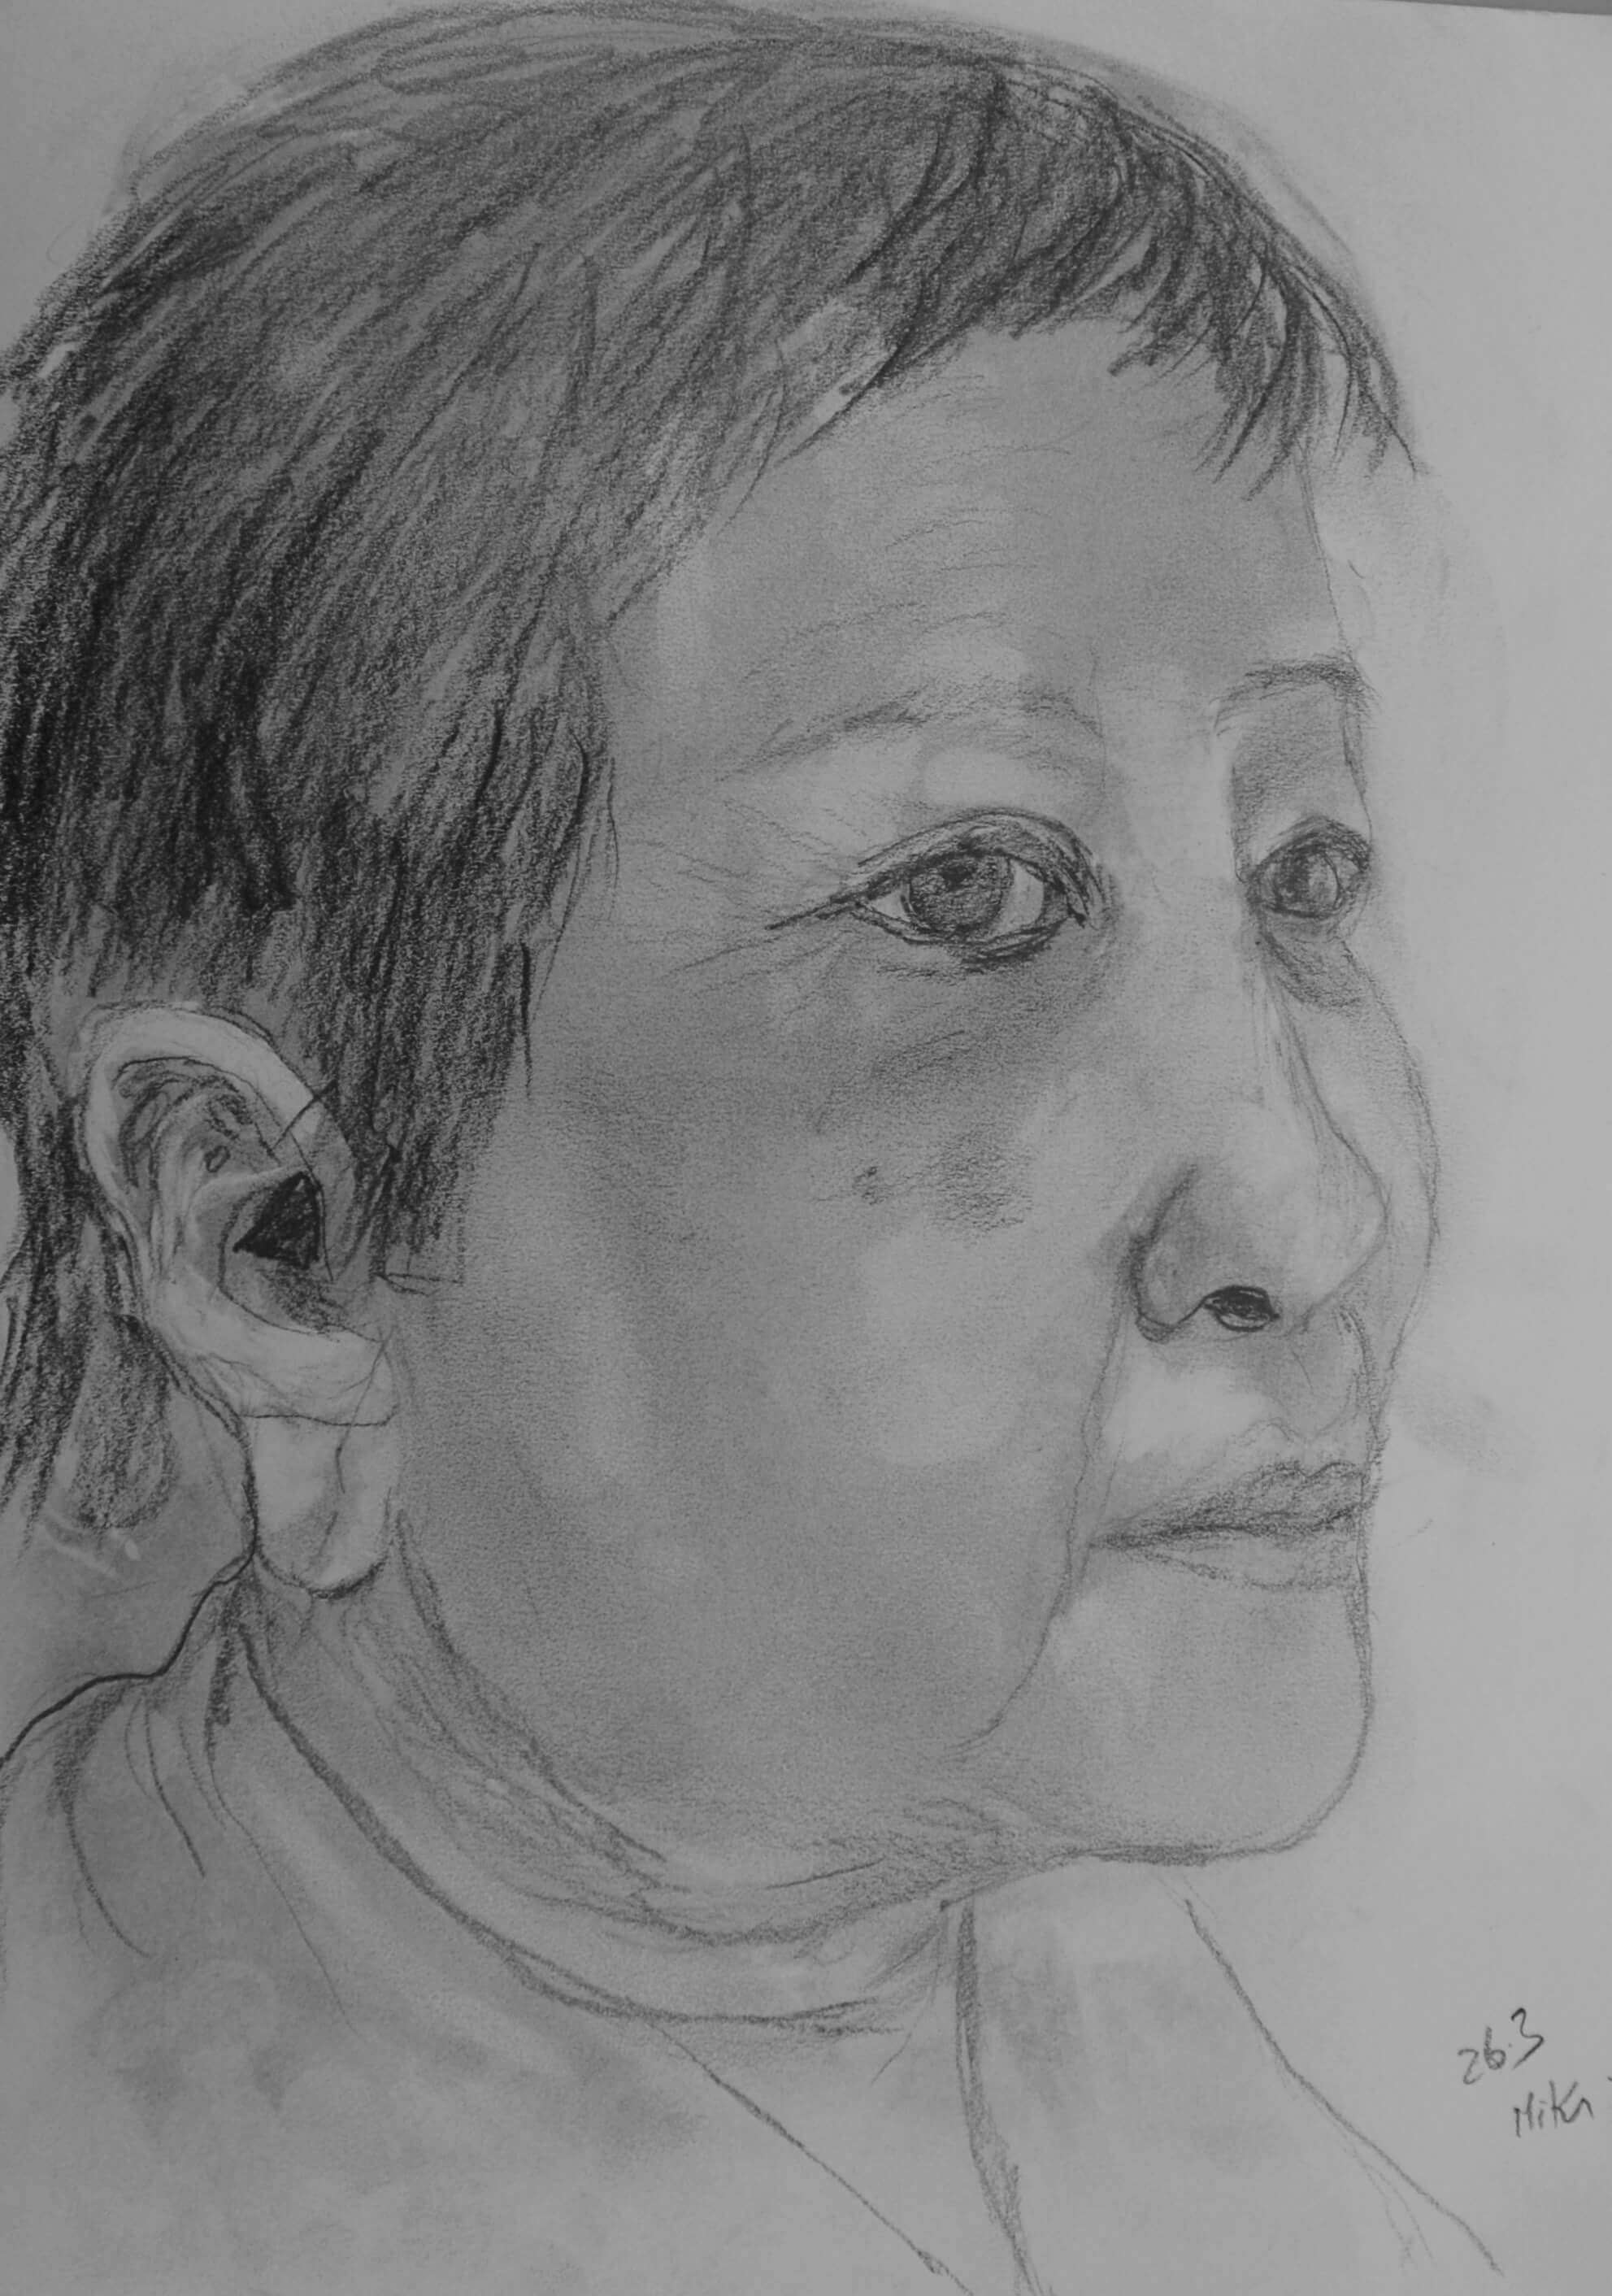 Miki, Seitenportrait